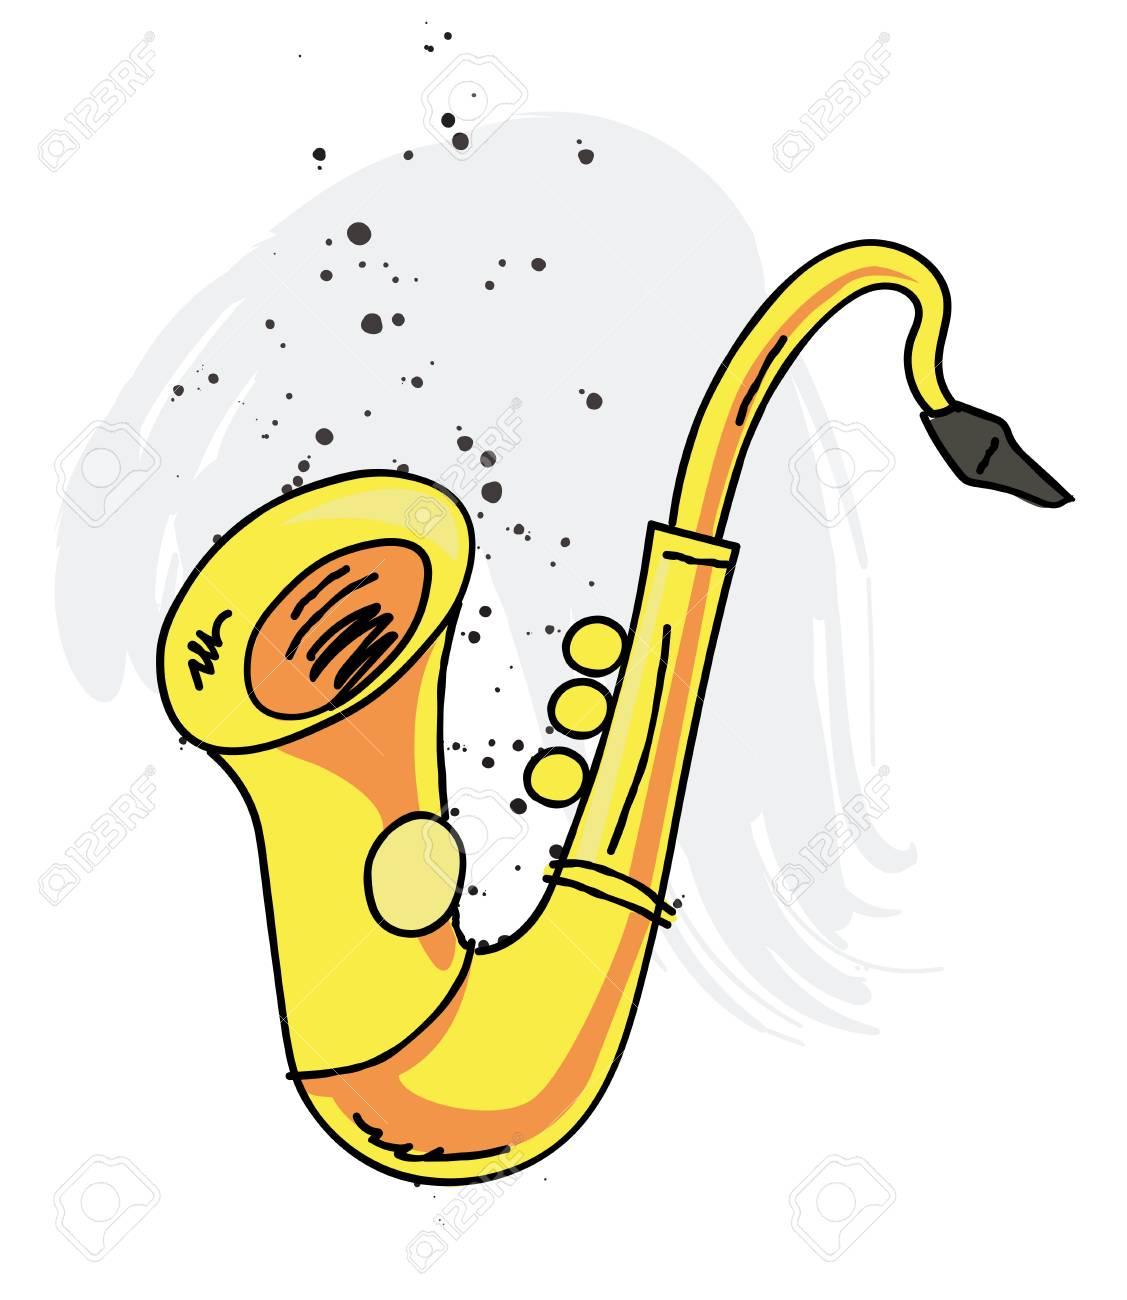 Dessin Saxophone saxophone cartoon hand drawn image royalty free cliparts, vectors